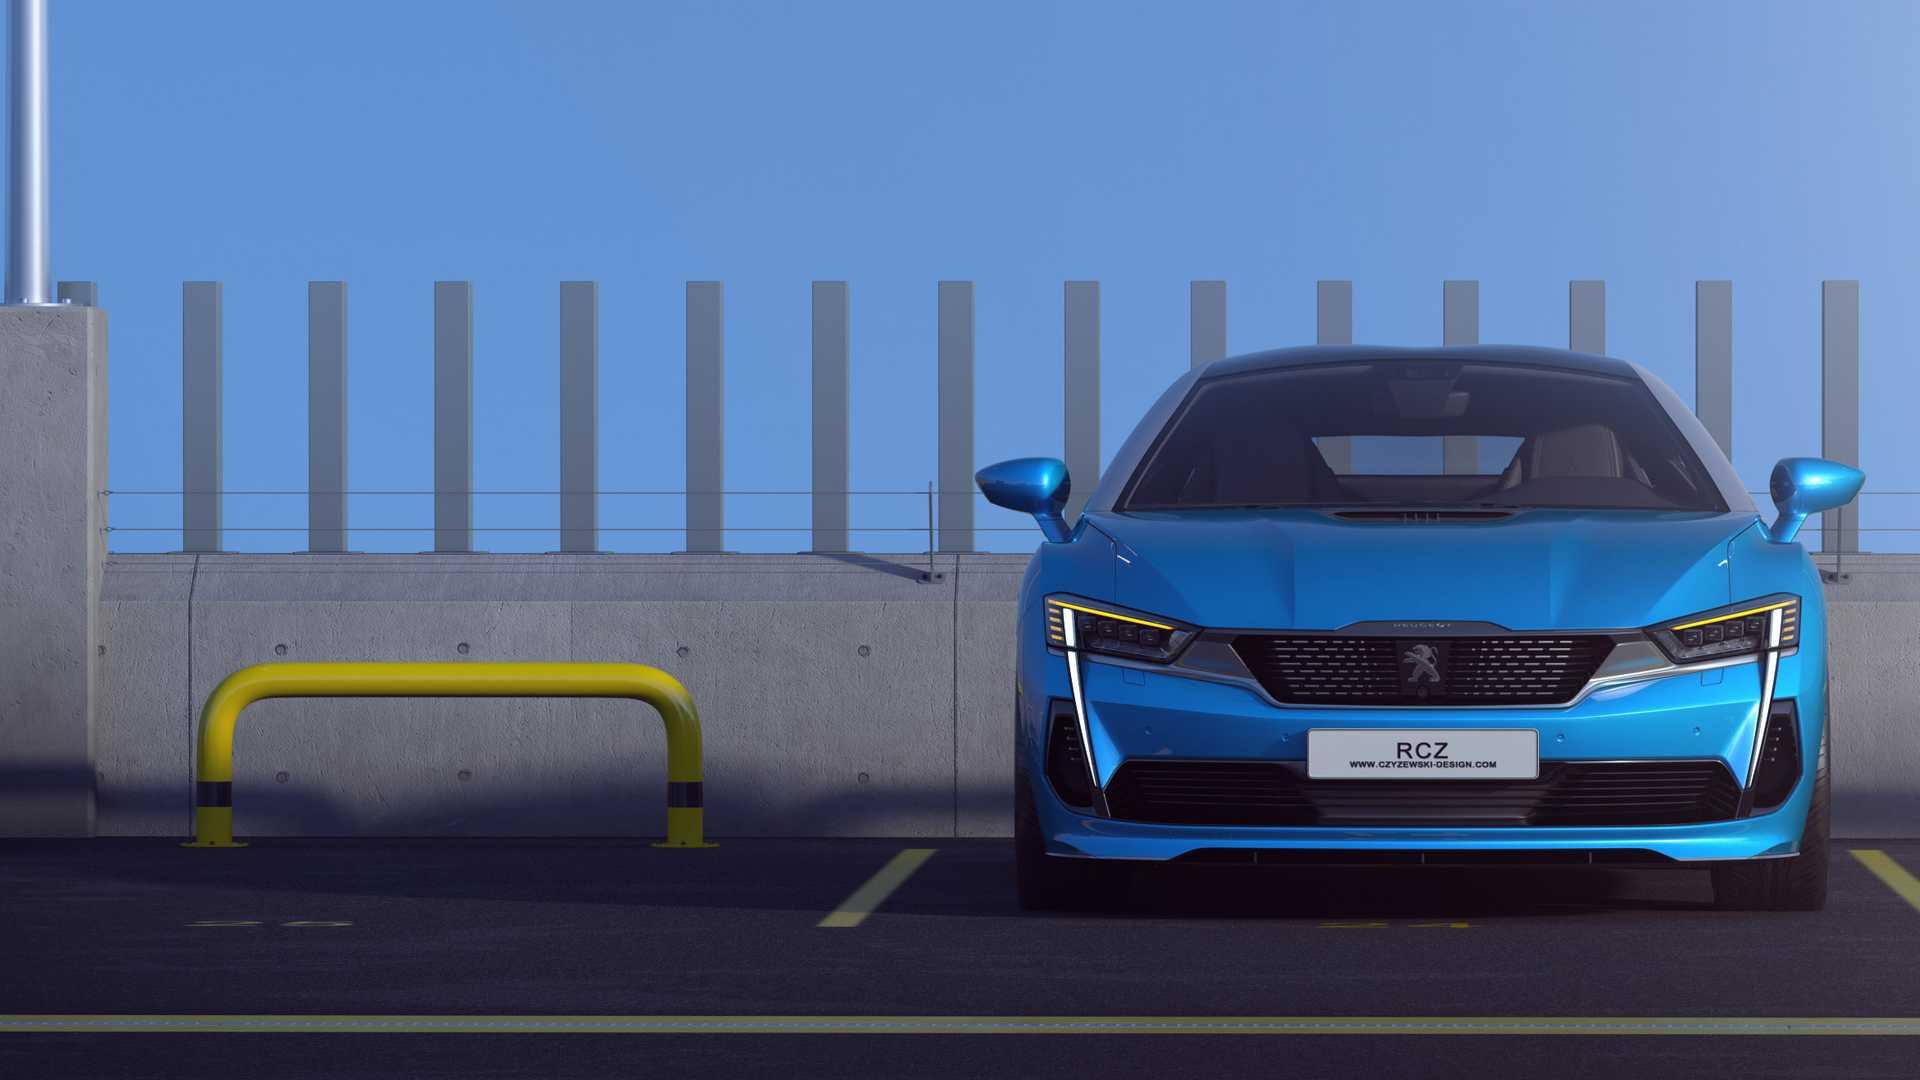 2020_Peugeot_RCZ_rendering_0004